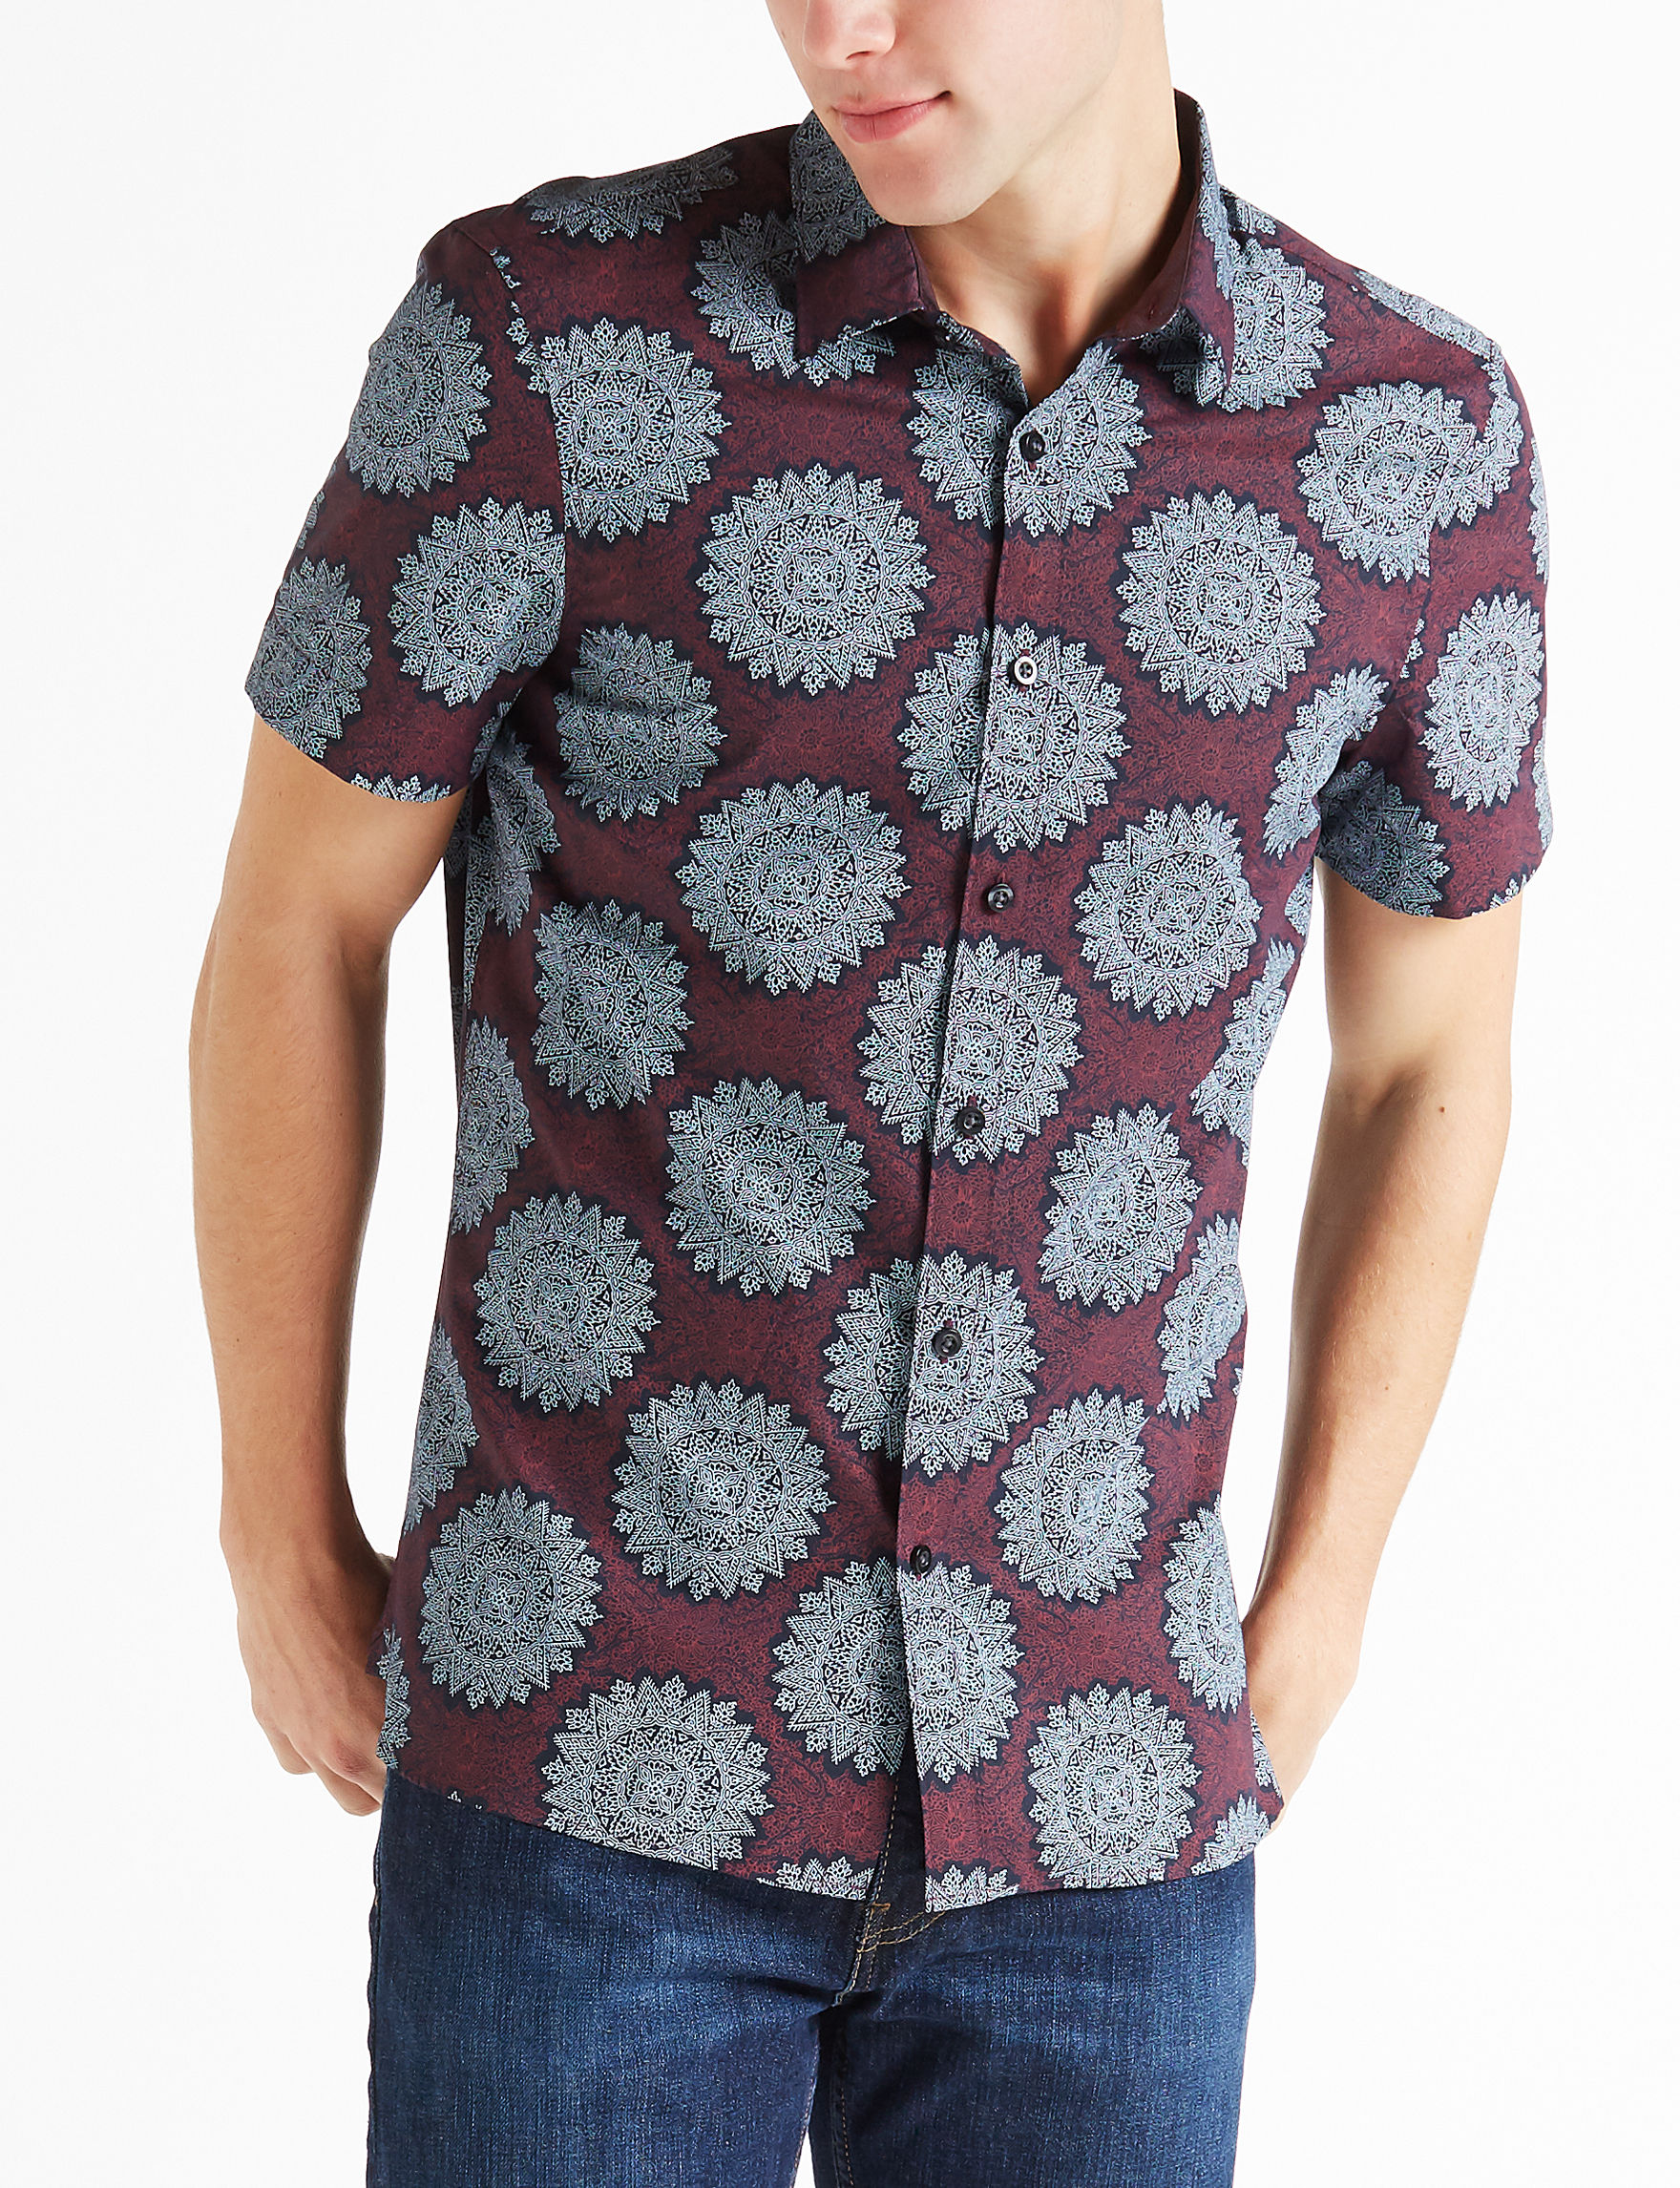 Axist Burgundy/Grey Casual Button Down Shirts